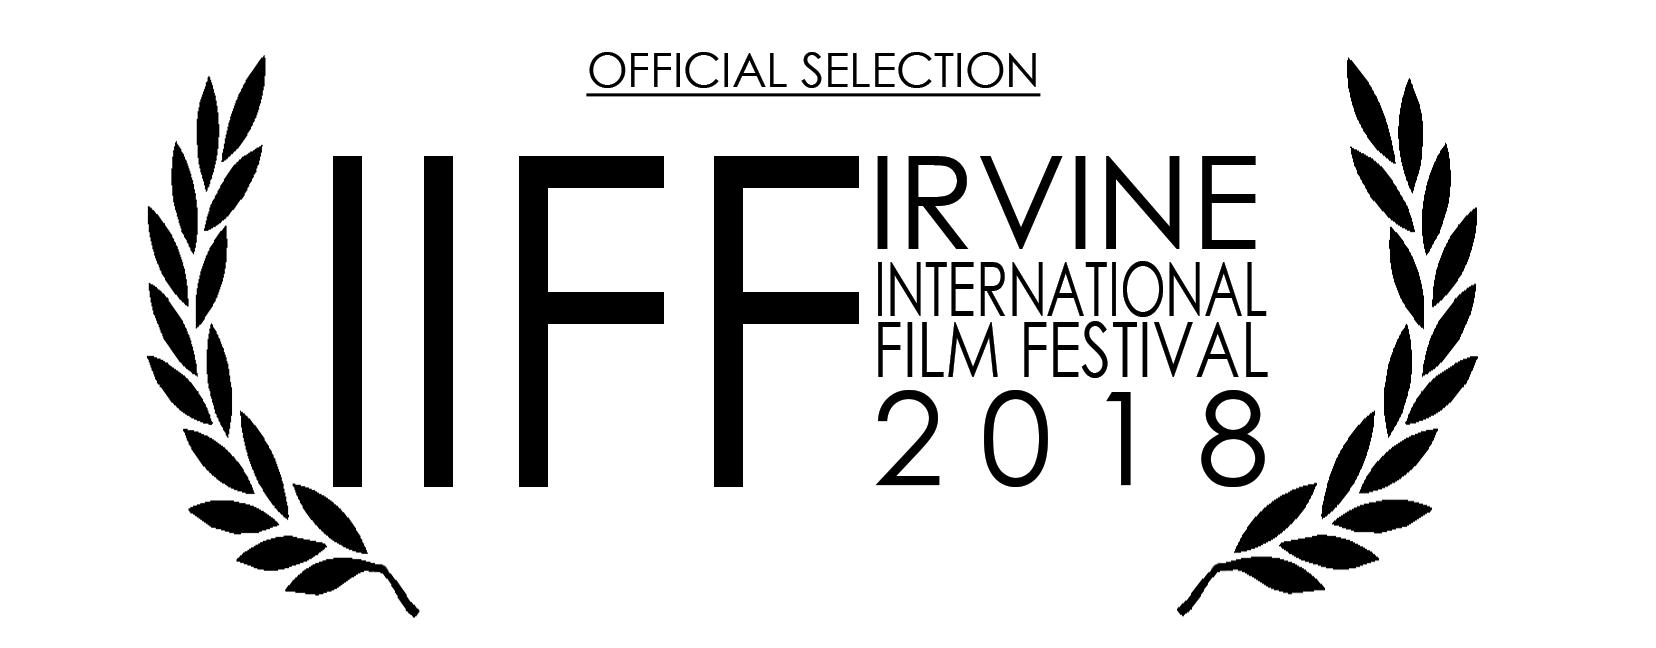 IIFF_FILM_FEST_18_Black_.png